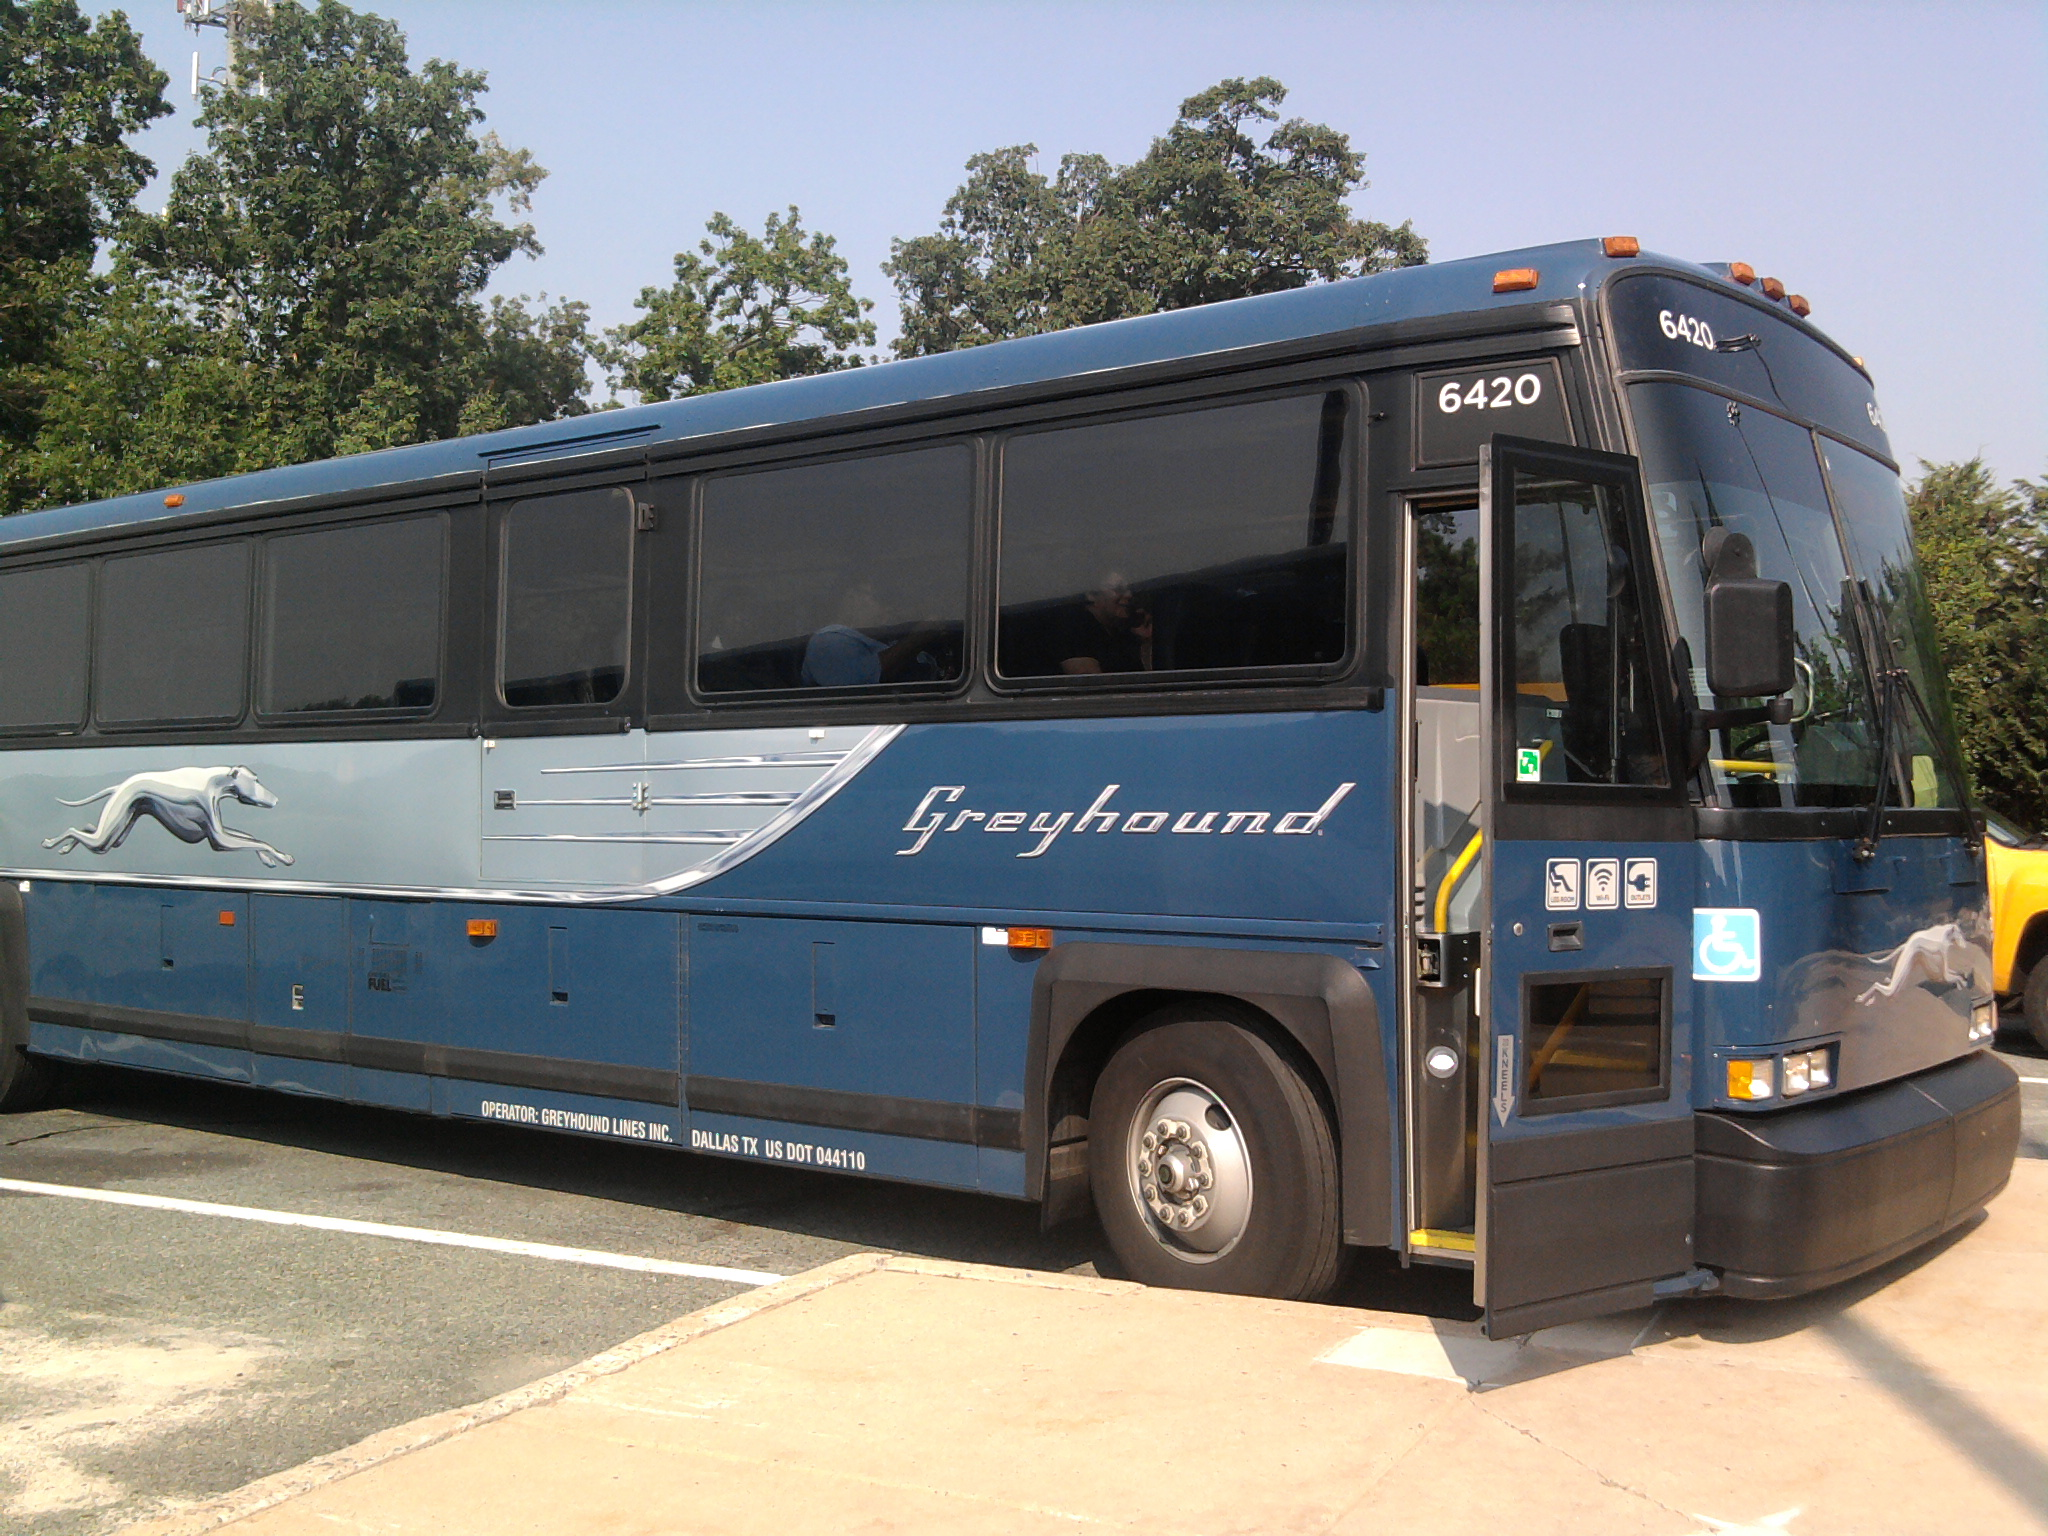 Greyhound_bus_on_the_way_to_Washington-1